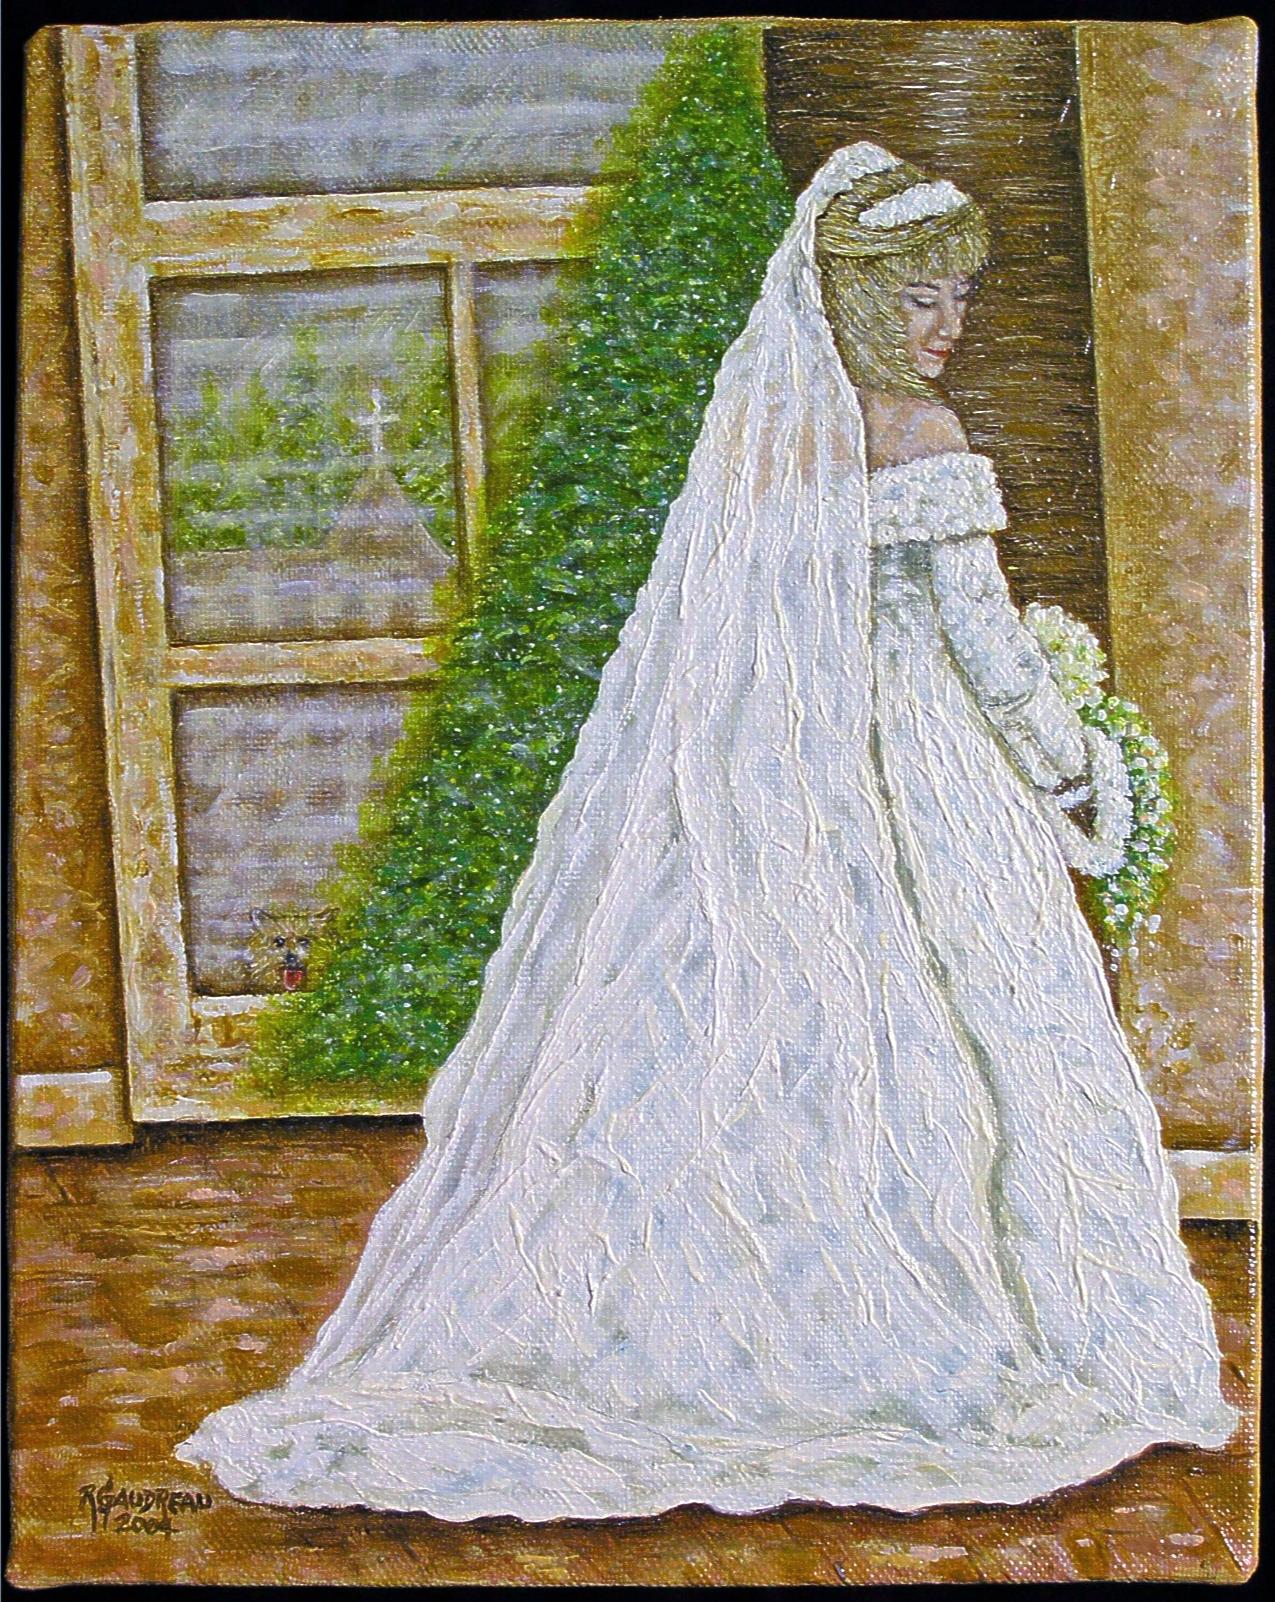 Arlene's Wedding Day  2004 oil on linen 20 x 16 inches